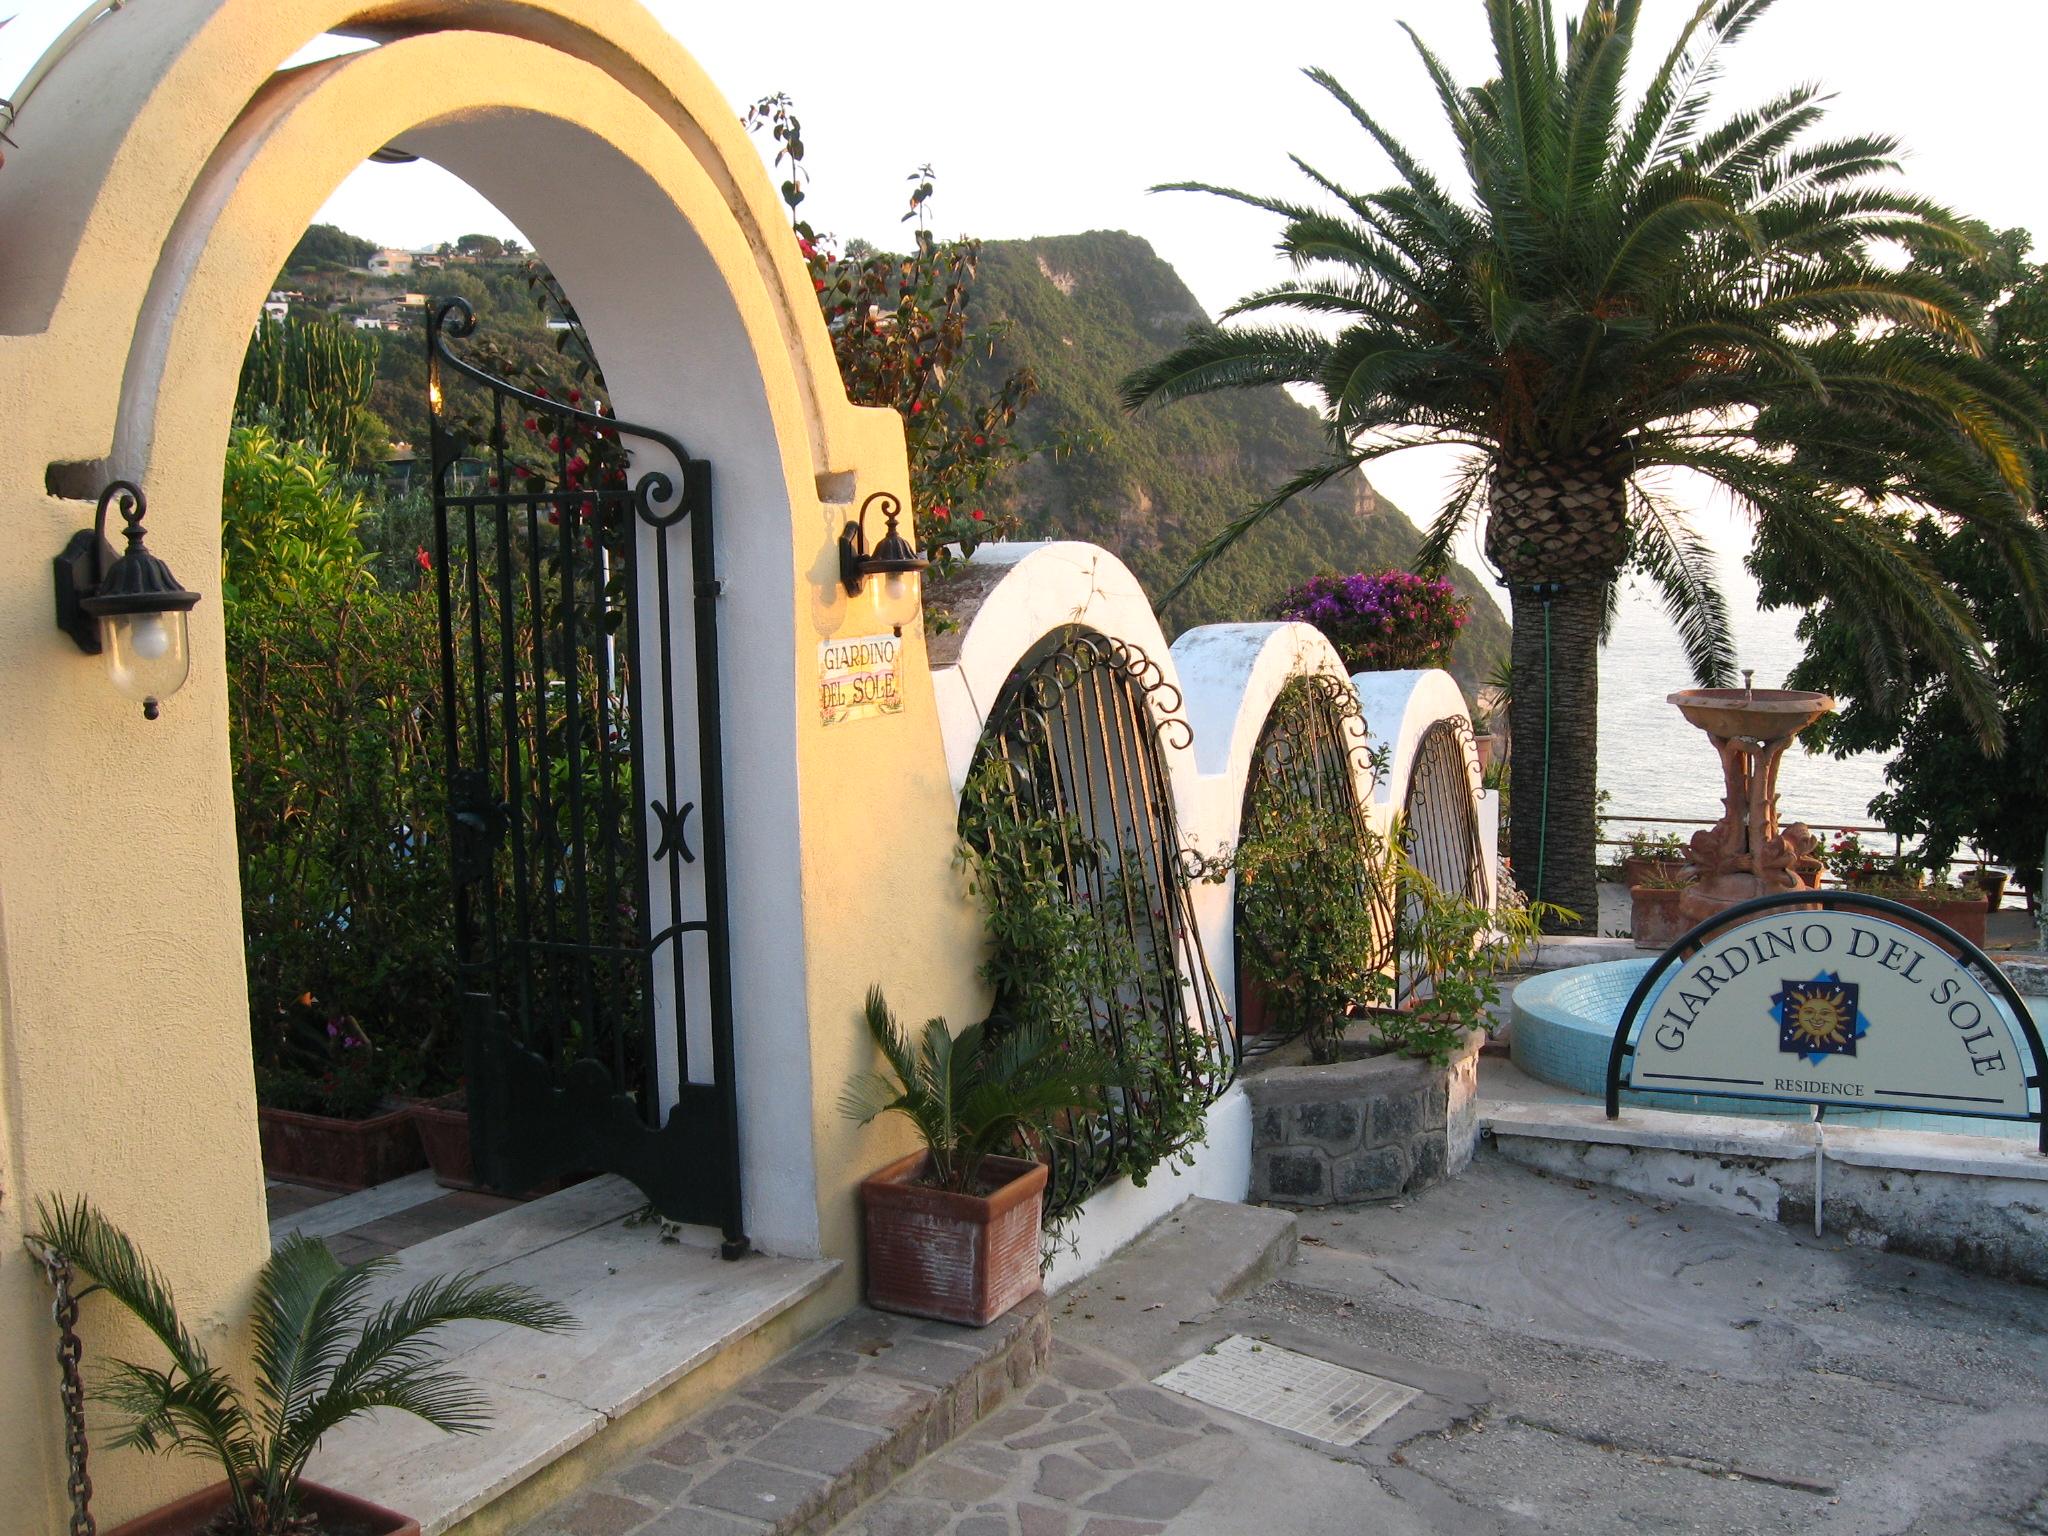 Residence Giardino del Sole